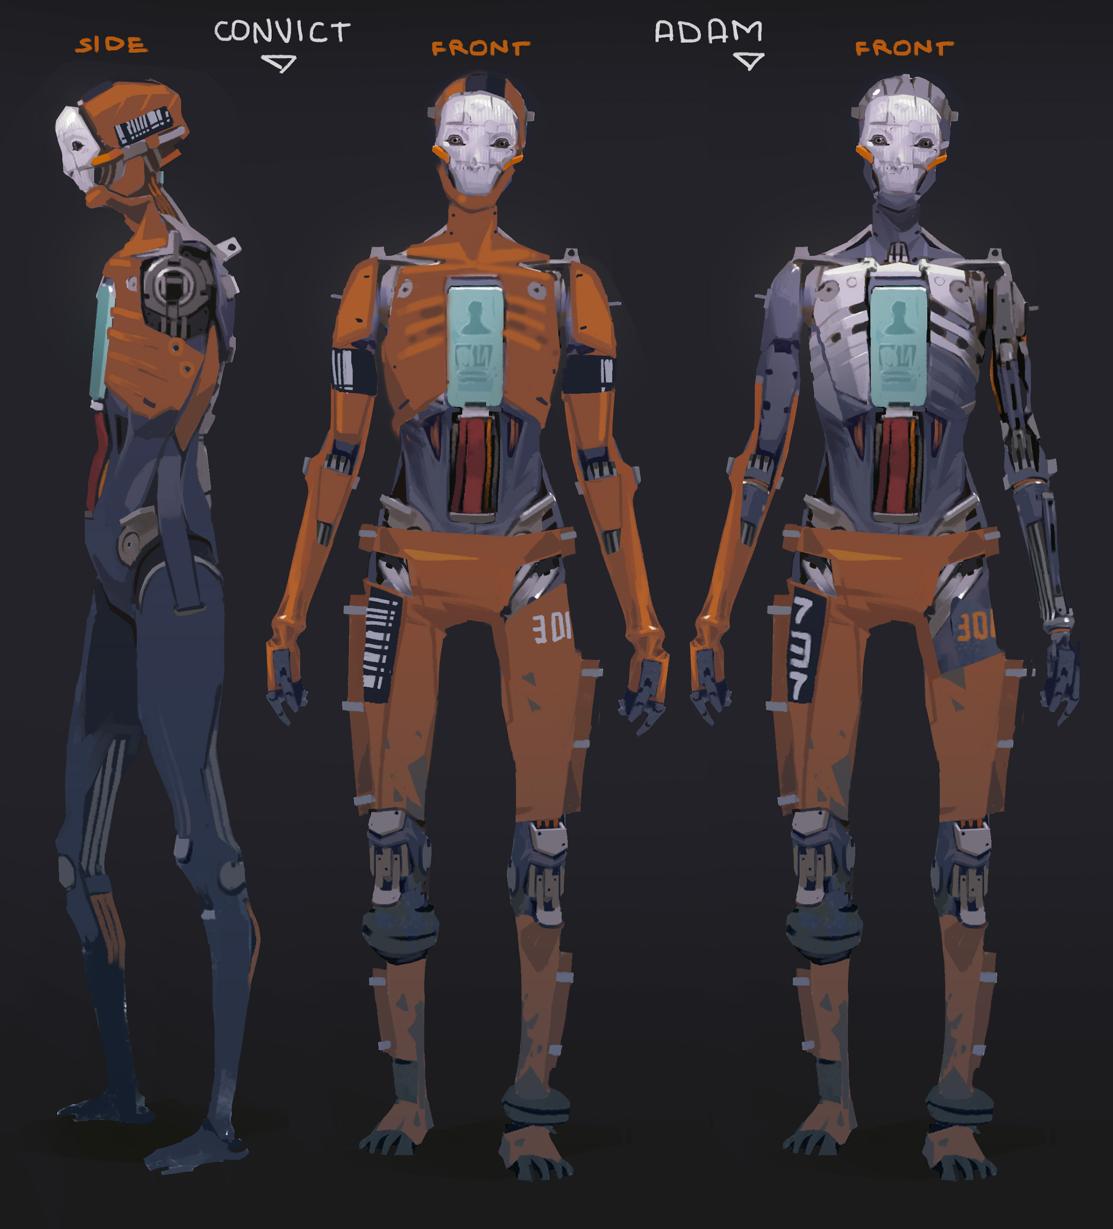 Character Design Unity : Robot samurai more short film cyberpunk and sci fi ideas